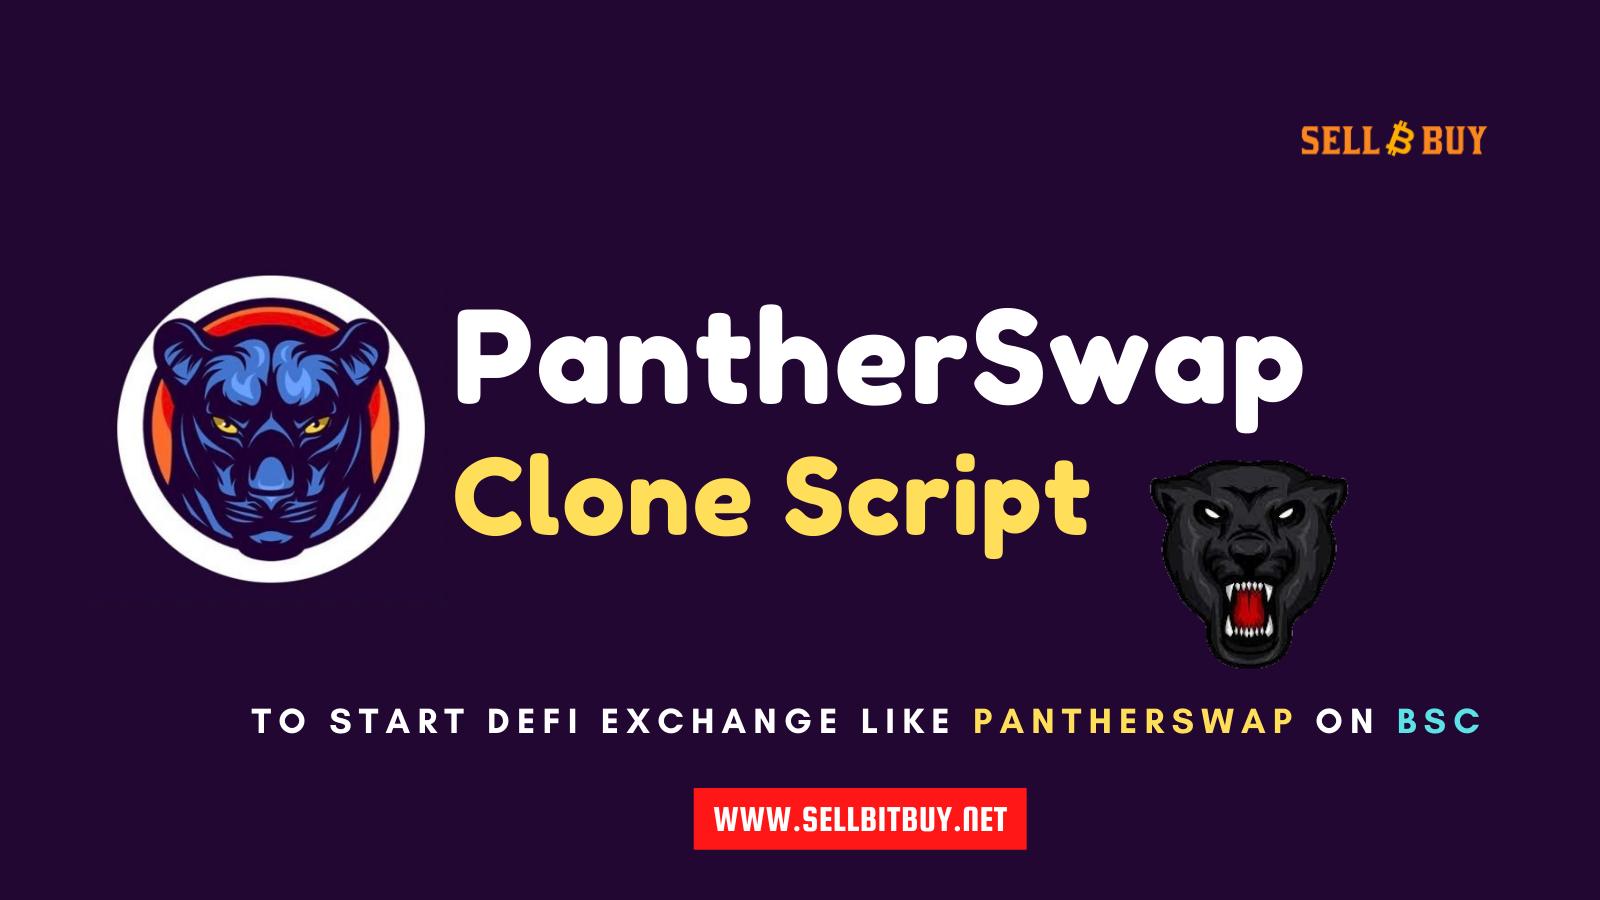 PantherSwap - To Create & Launch A DeFi Exchange Like PantherSwap On Binance Smart Chain